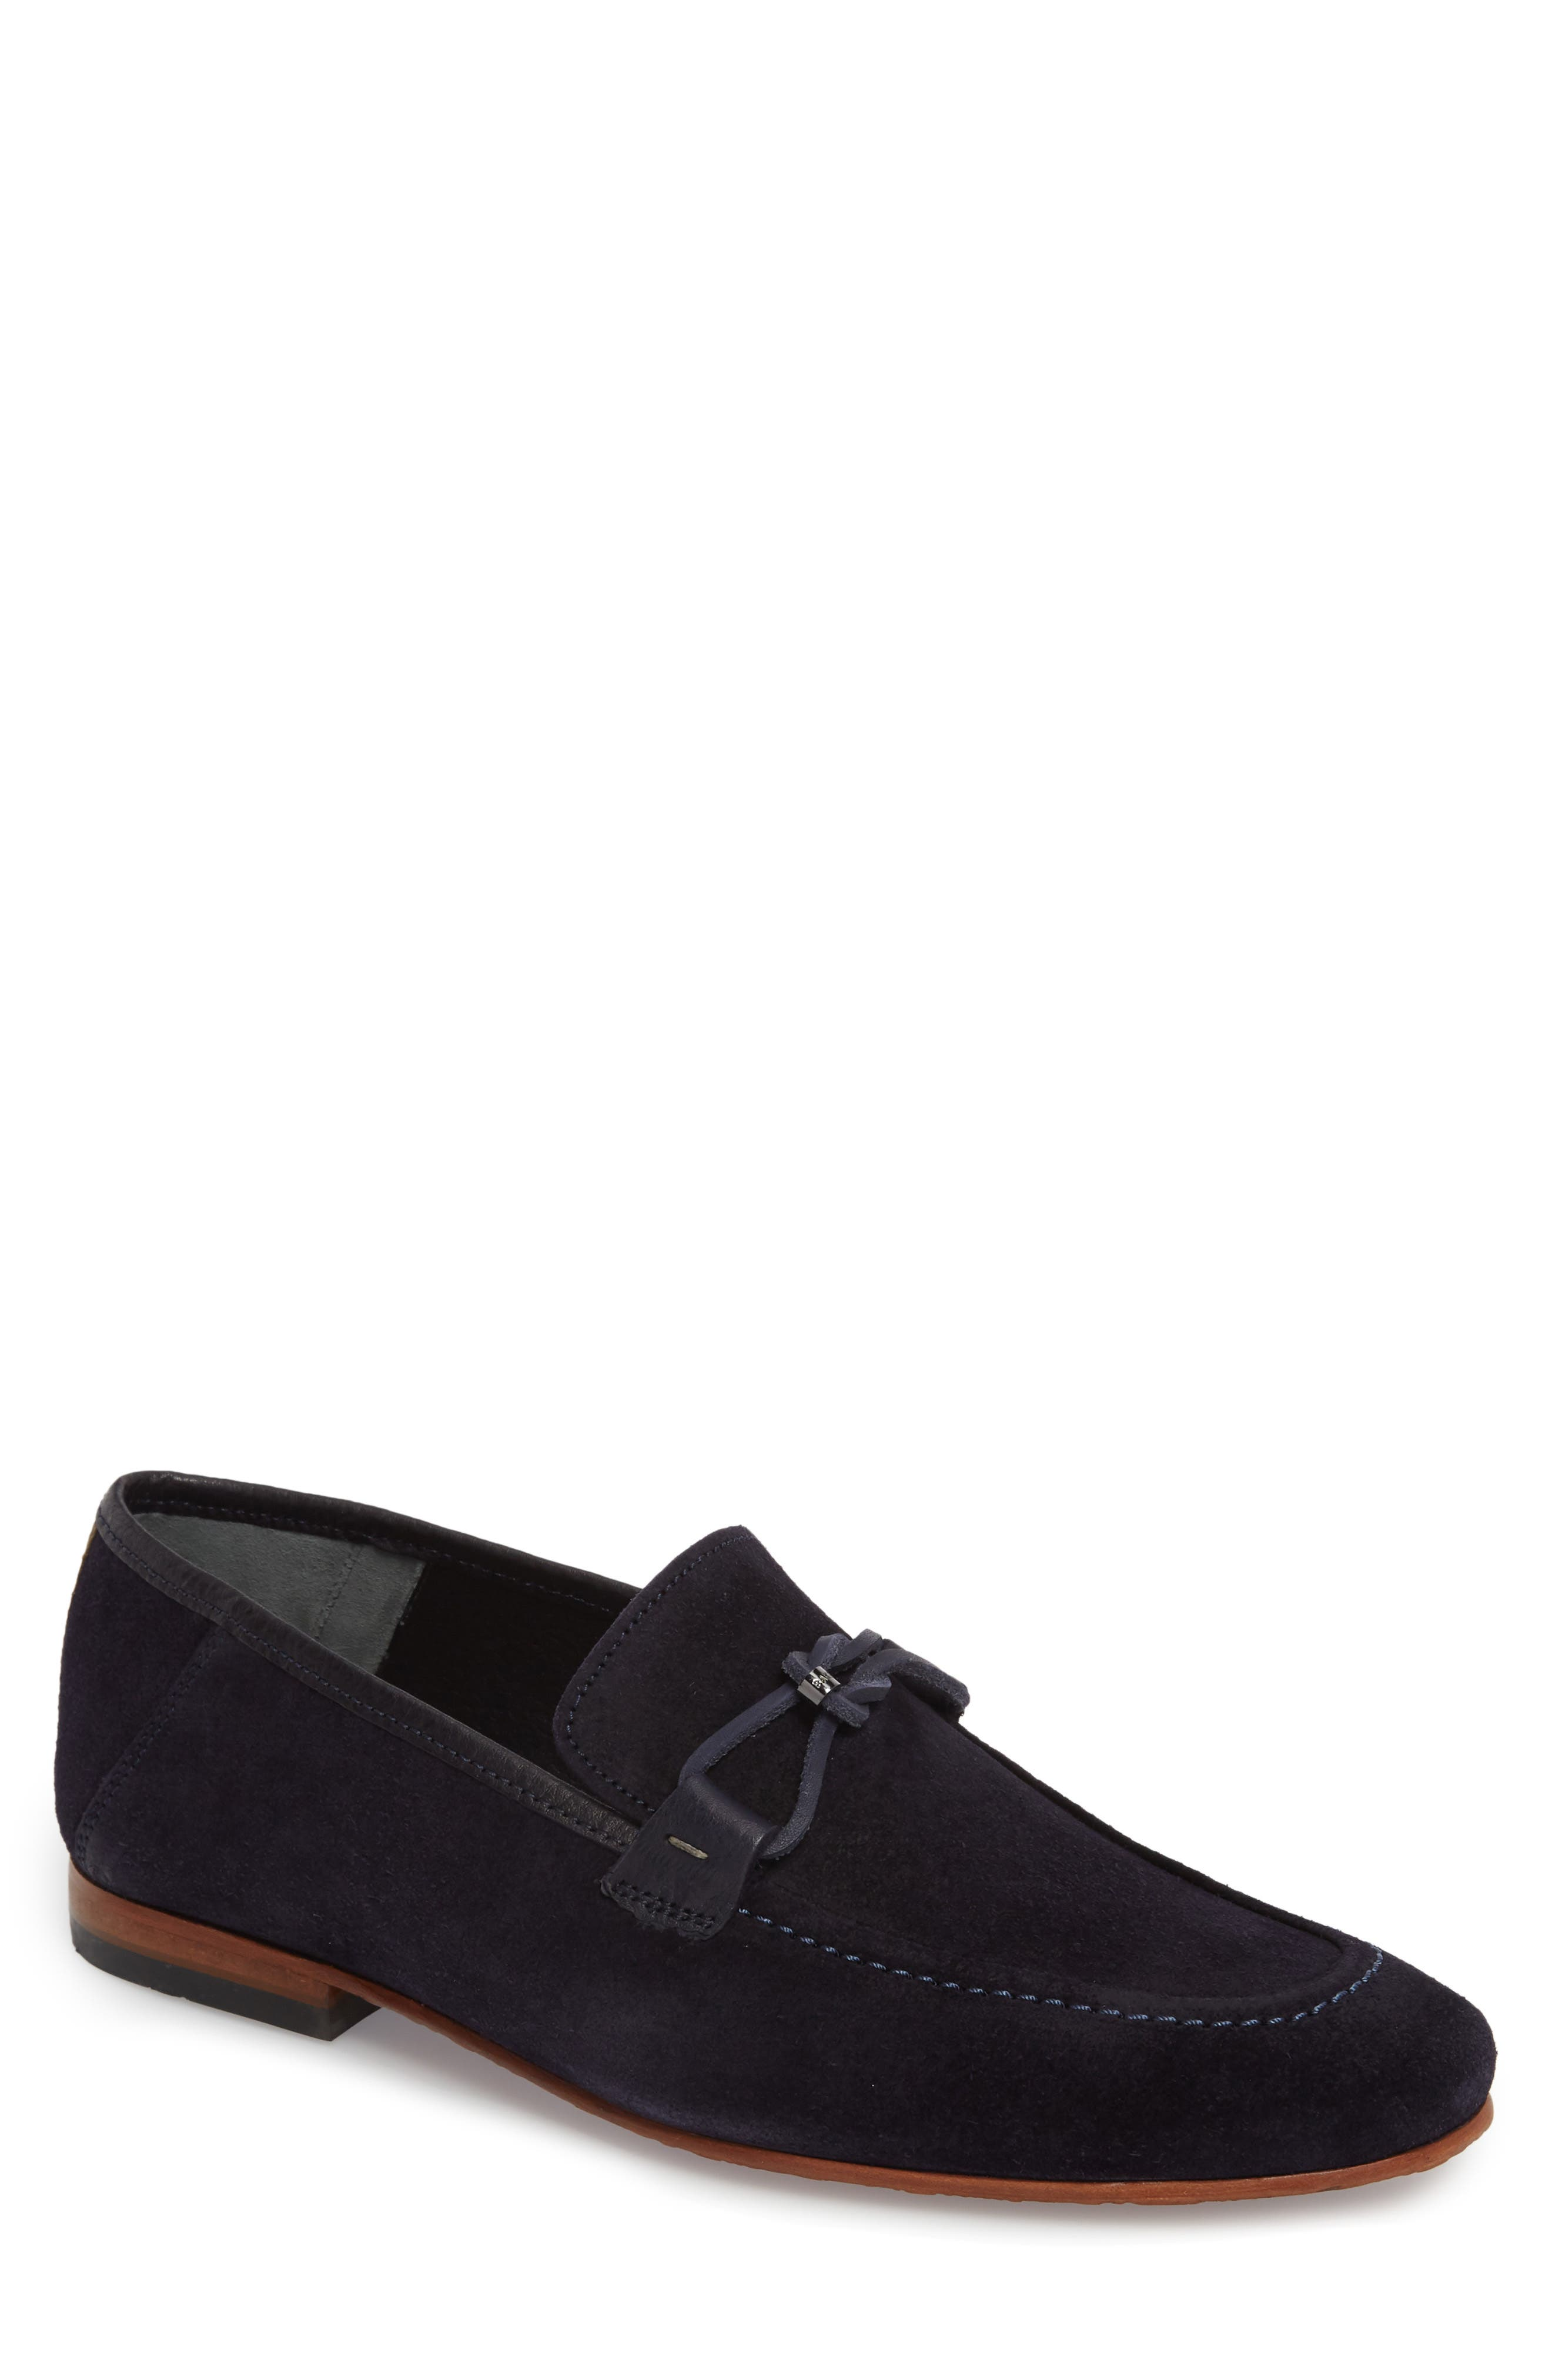 Hoppken Convertible Knotted Loafer,                         Main,                         color, Dark Blue Suede